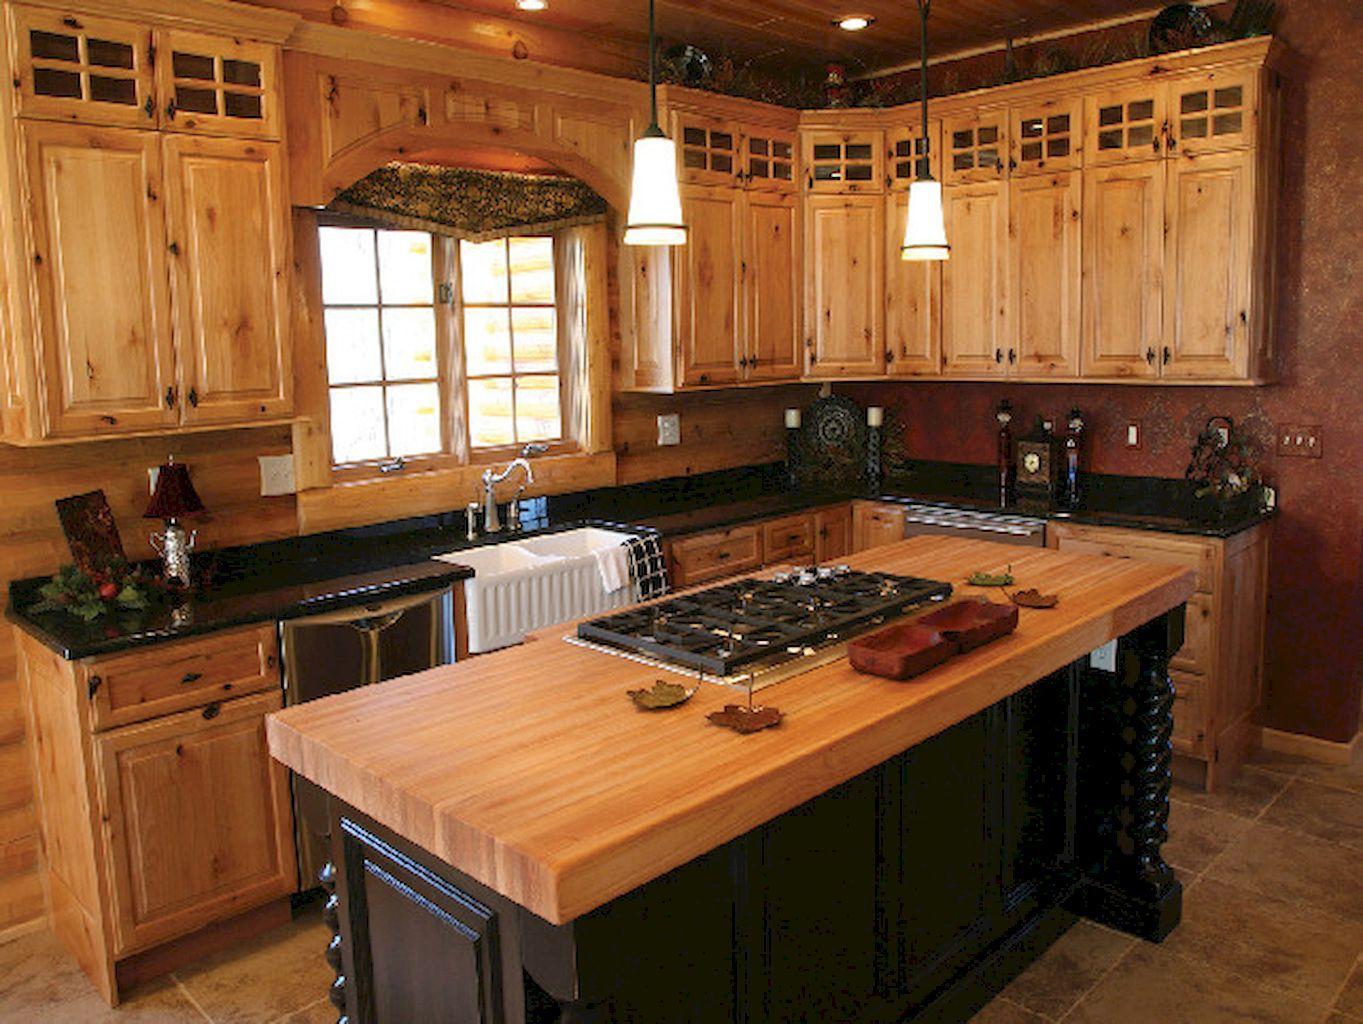 85 farmhouse style kitchen cabinet design ideas rustic kitchen cabinets pine kitchen cabinets on farmhouse kitchen hickory cabinets id=92096